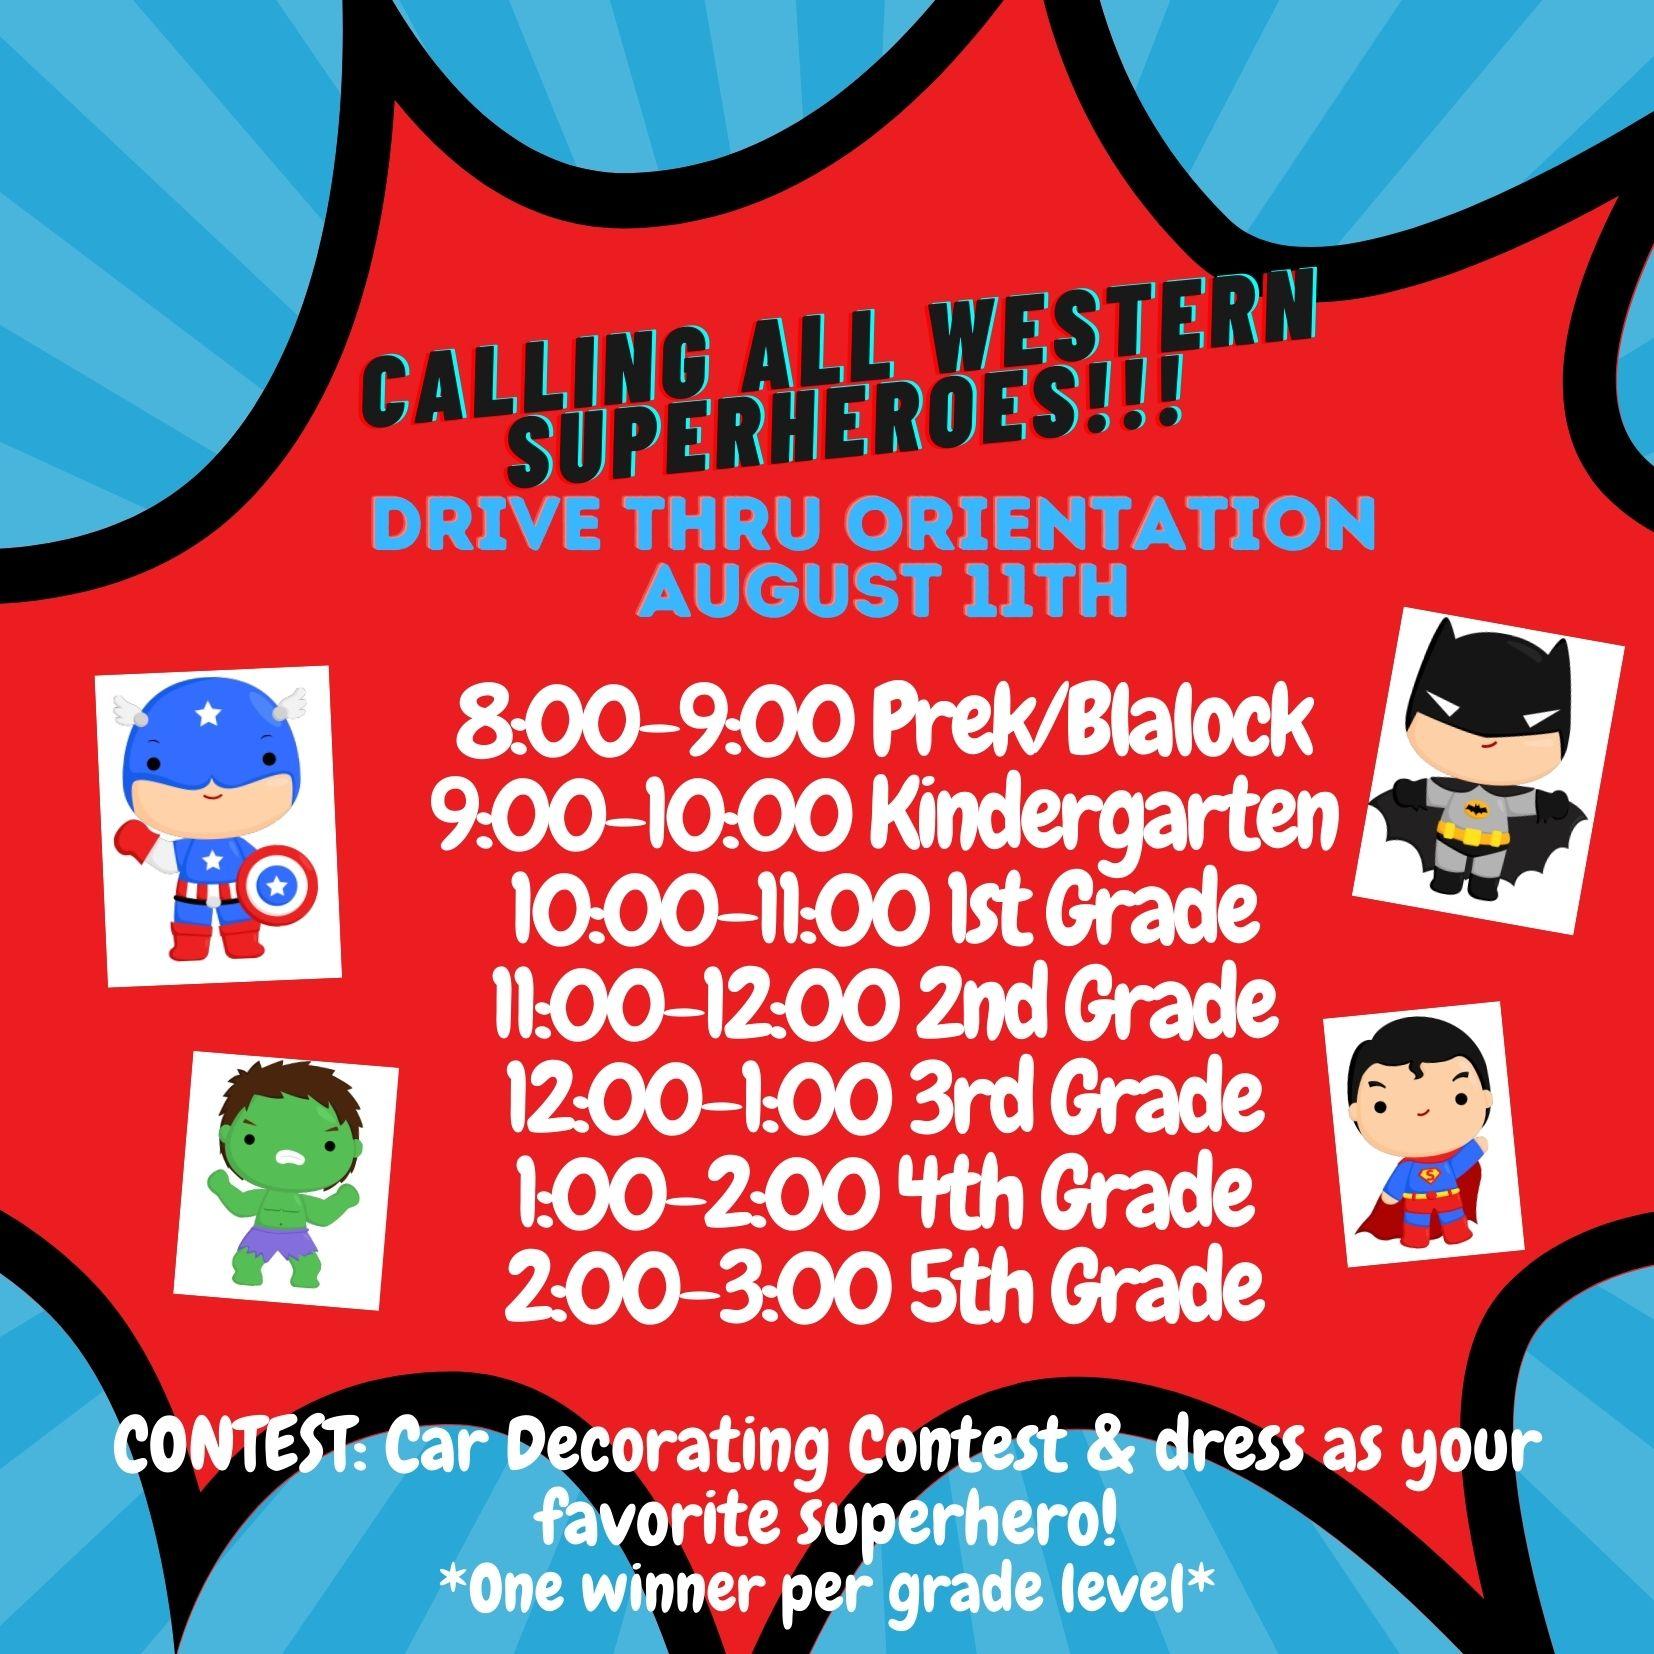 Aug. 11th - Western Drive Thru Orientation